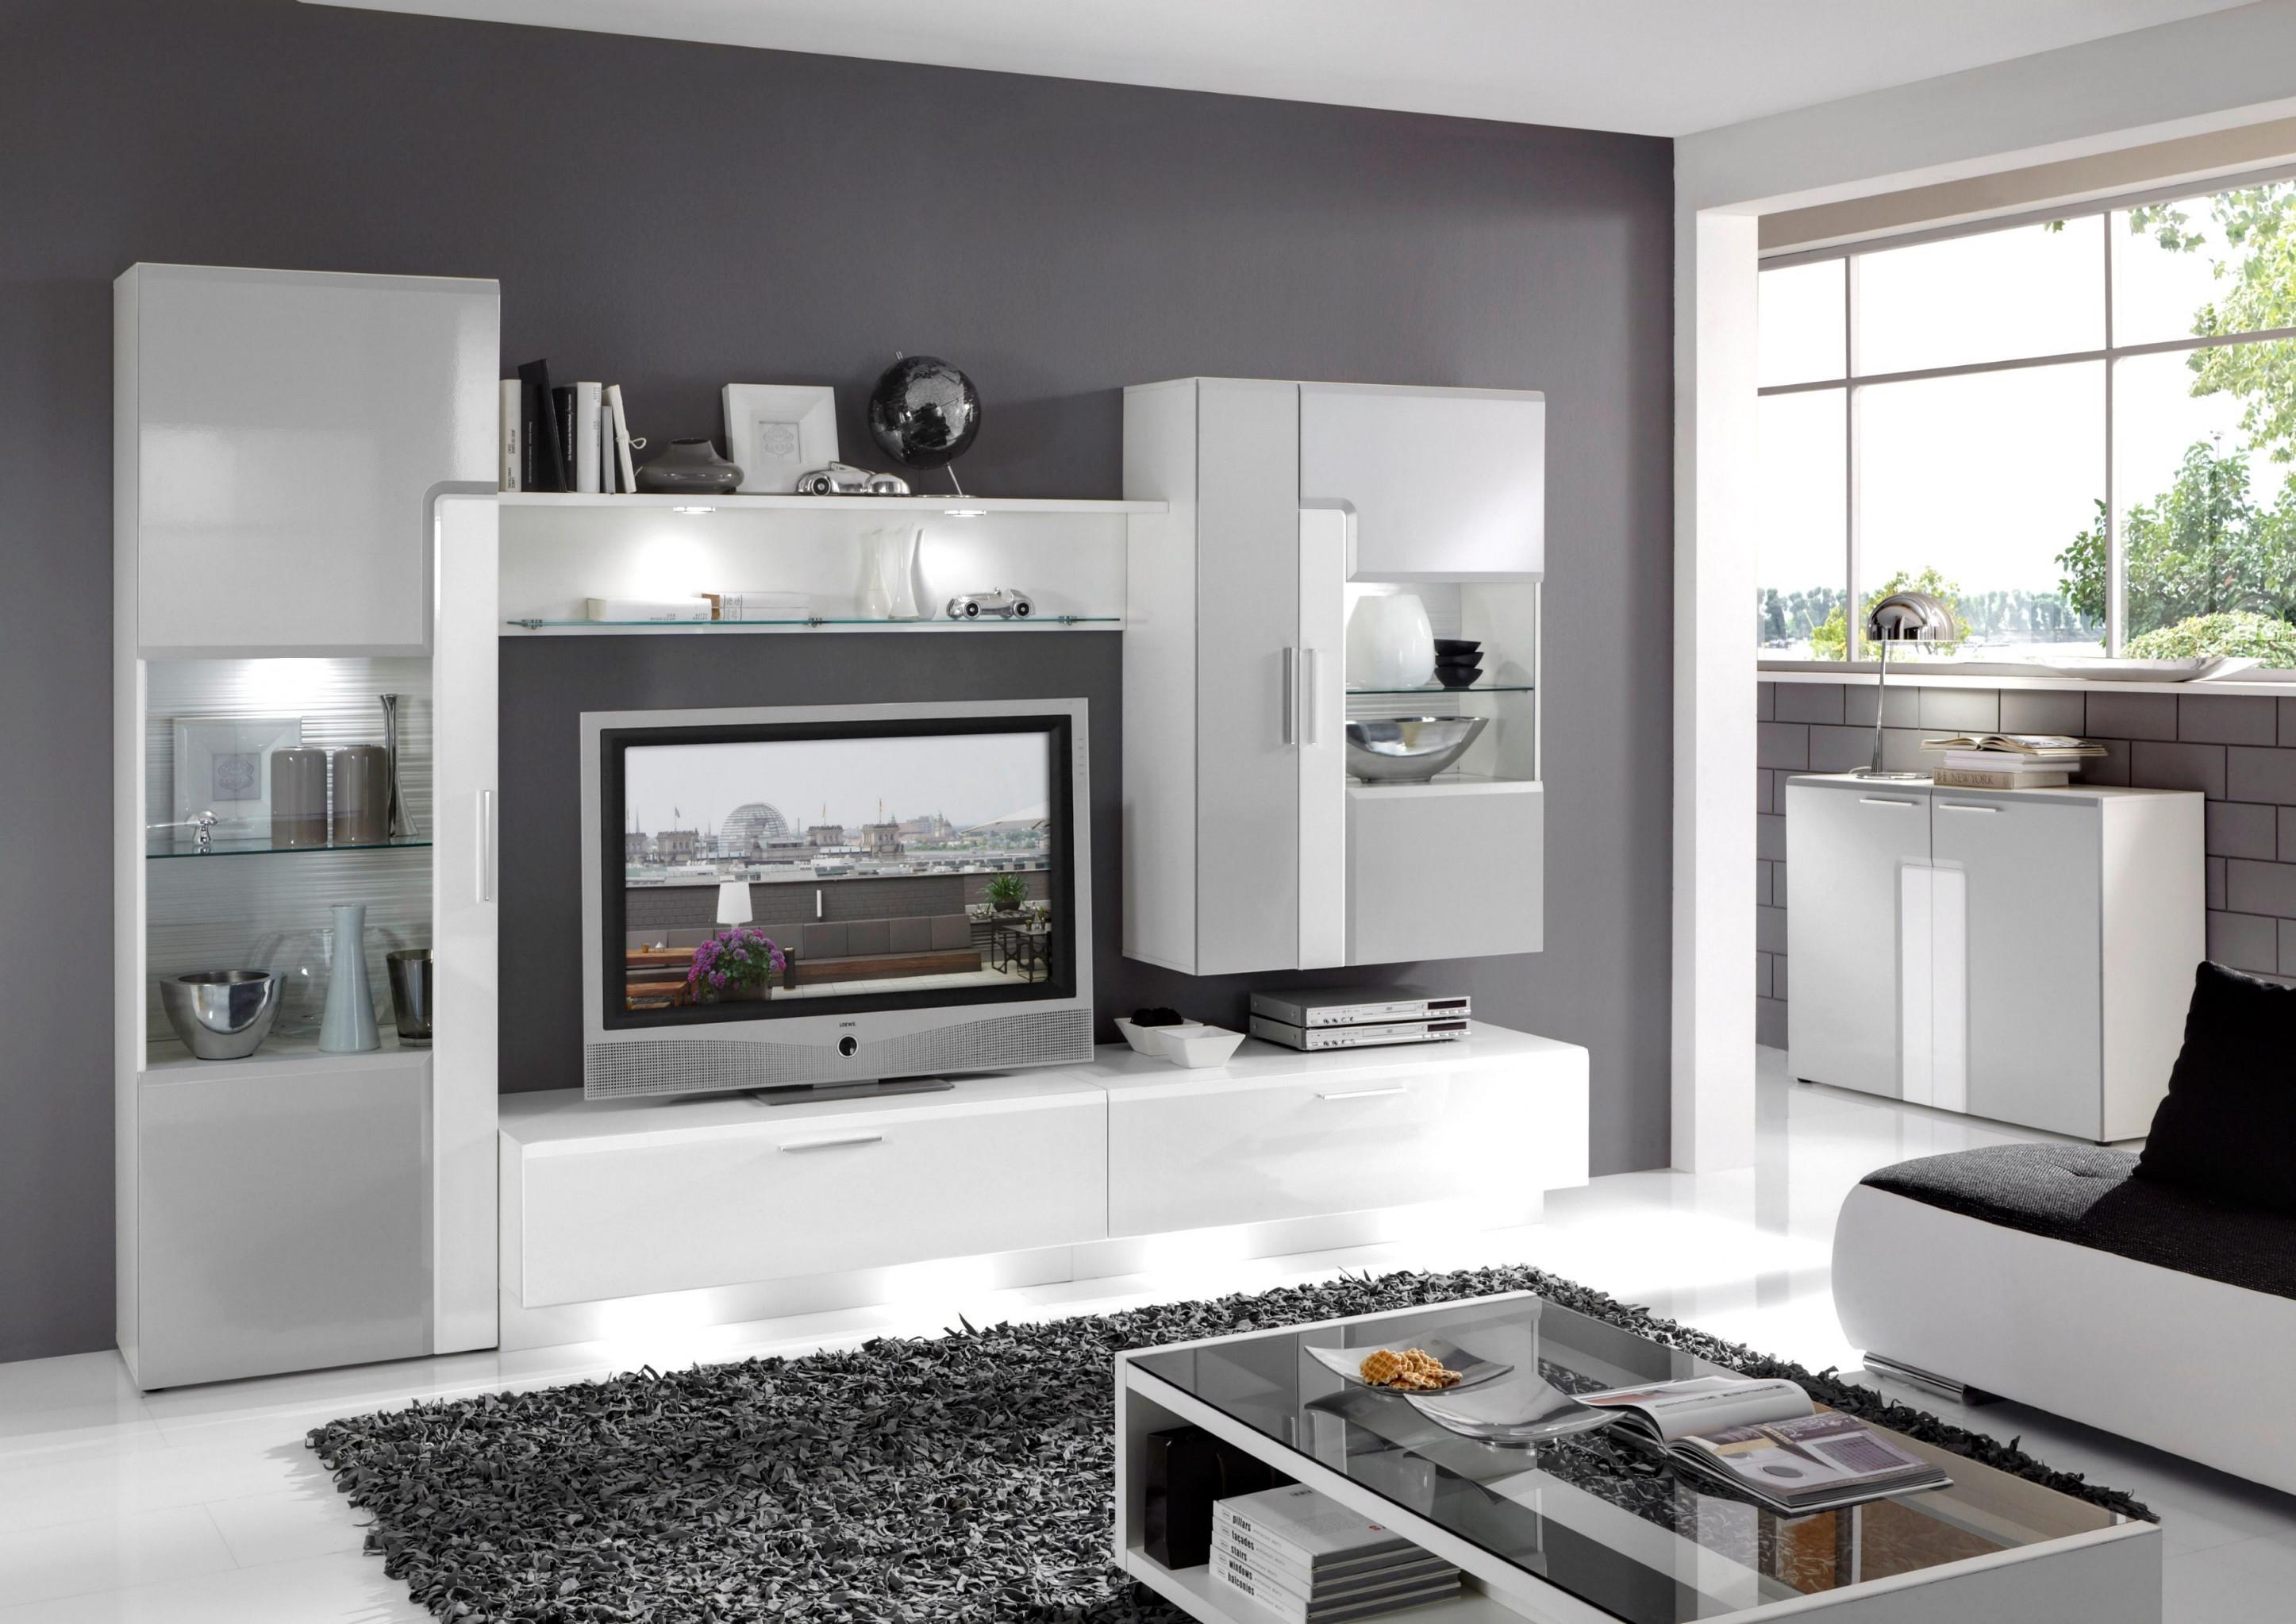 Graues Wohnzimmer Ideen  Living Room White Minimalist von Graues Wohnzimmer Ideen Bild